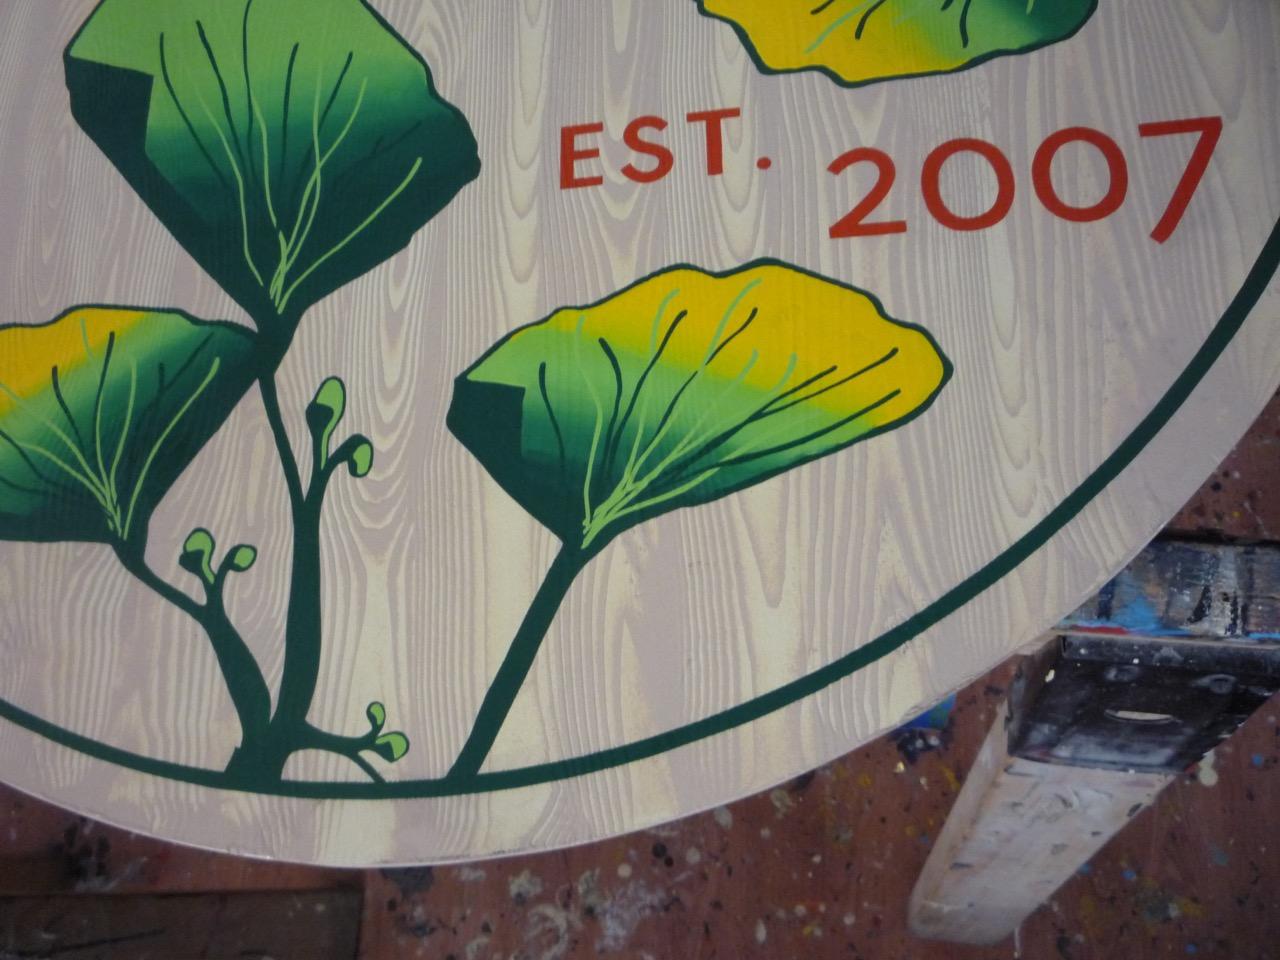 WOOD-faux-wood-grain-close-up-sucession_23917155935_o.jpg